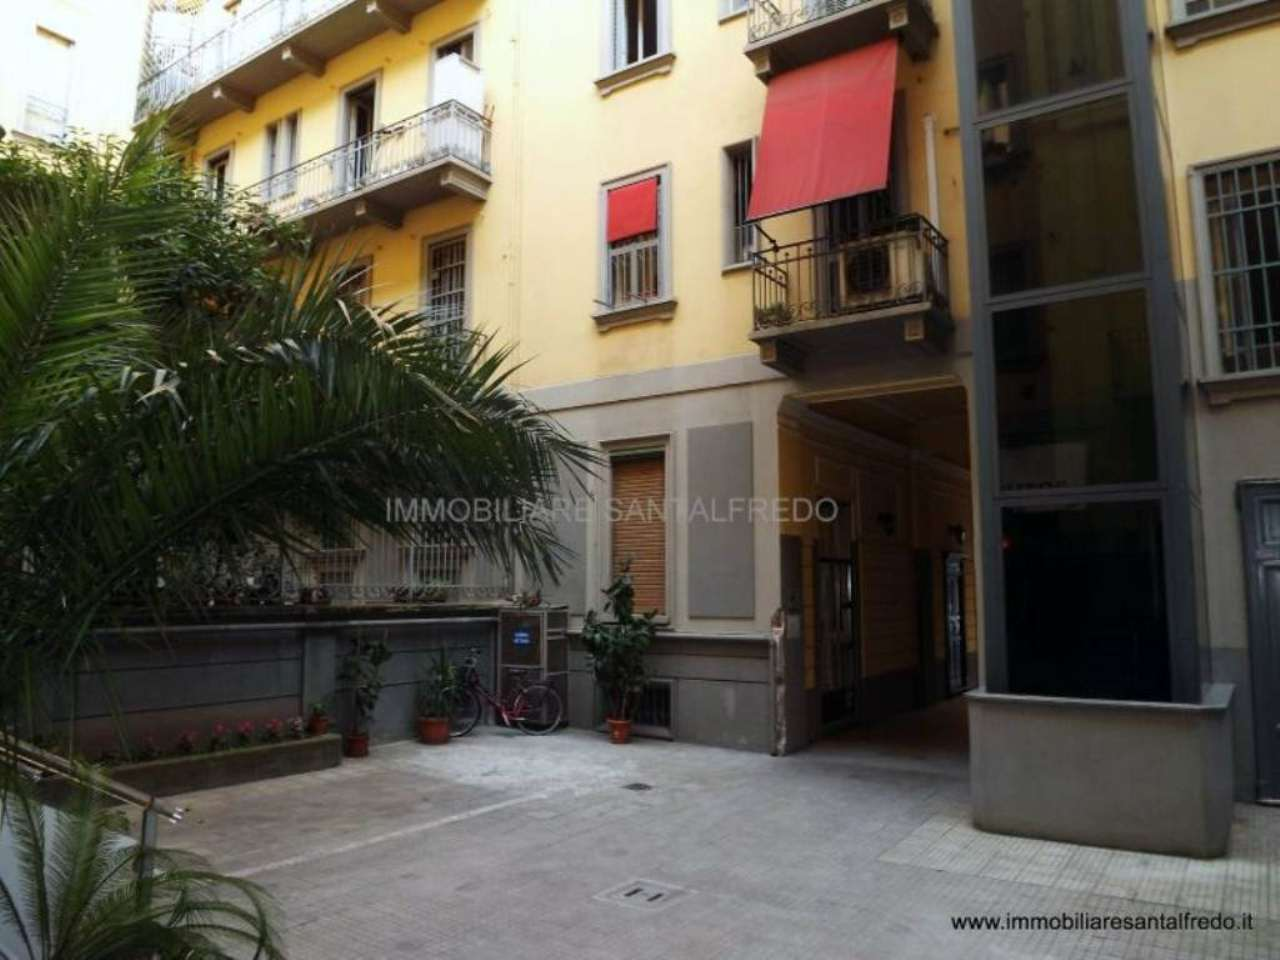 Bilocale Milano Corso Buenos Aires 2